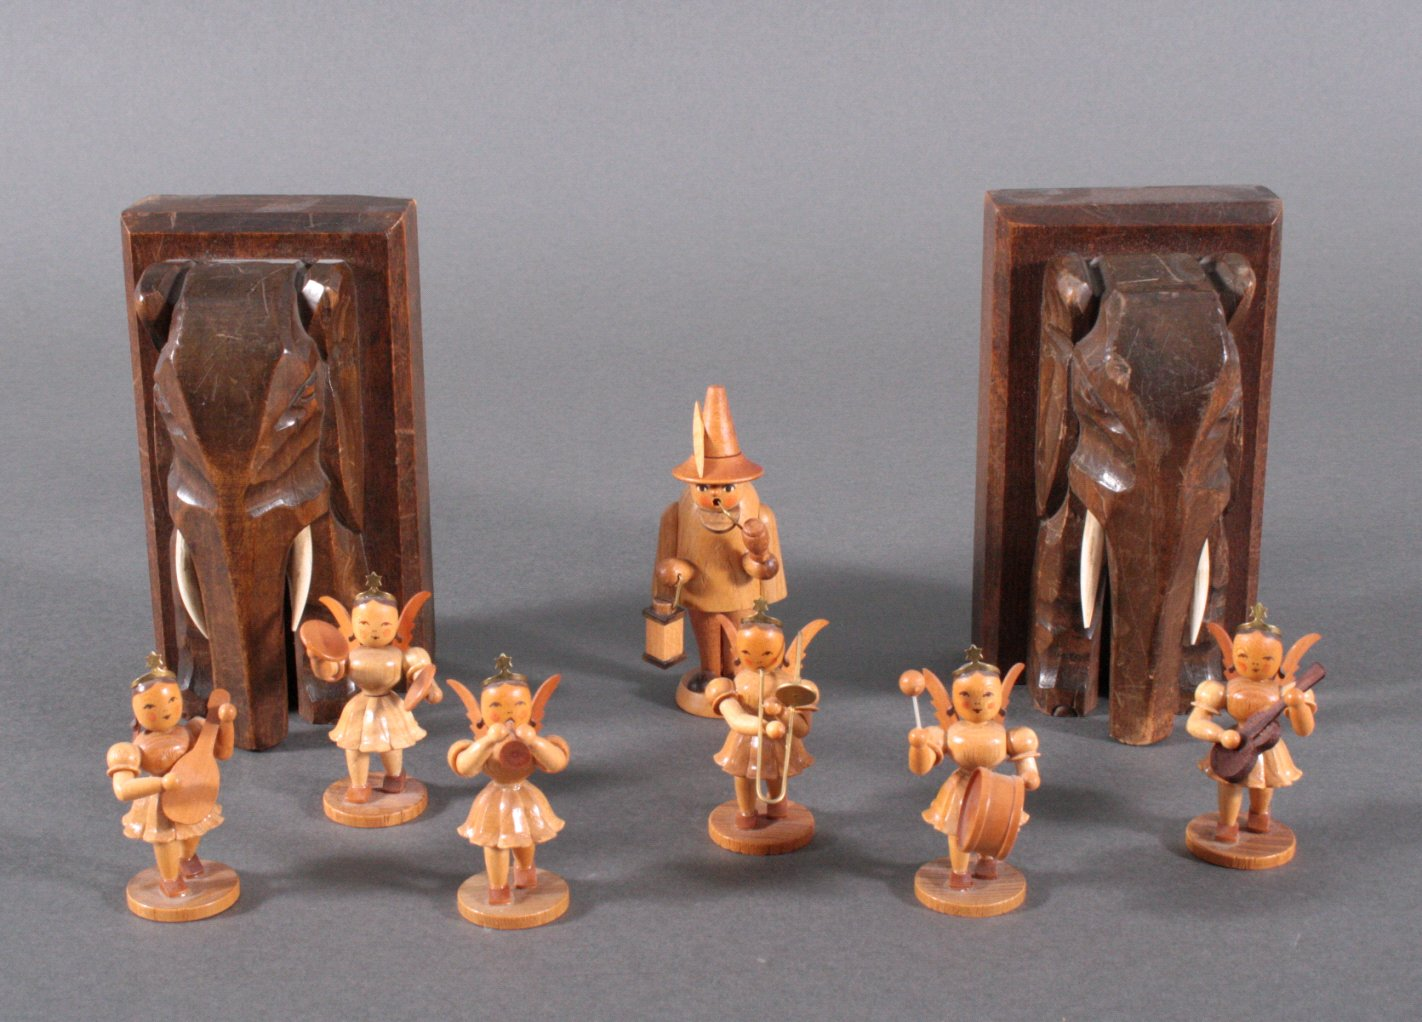 9 Teile Dekorationsgegenstände aus Holz